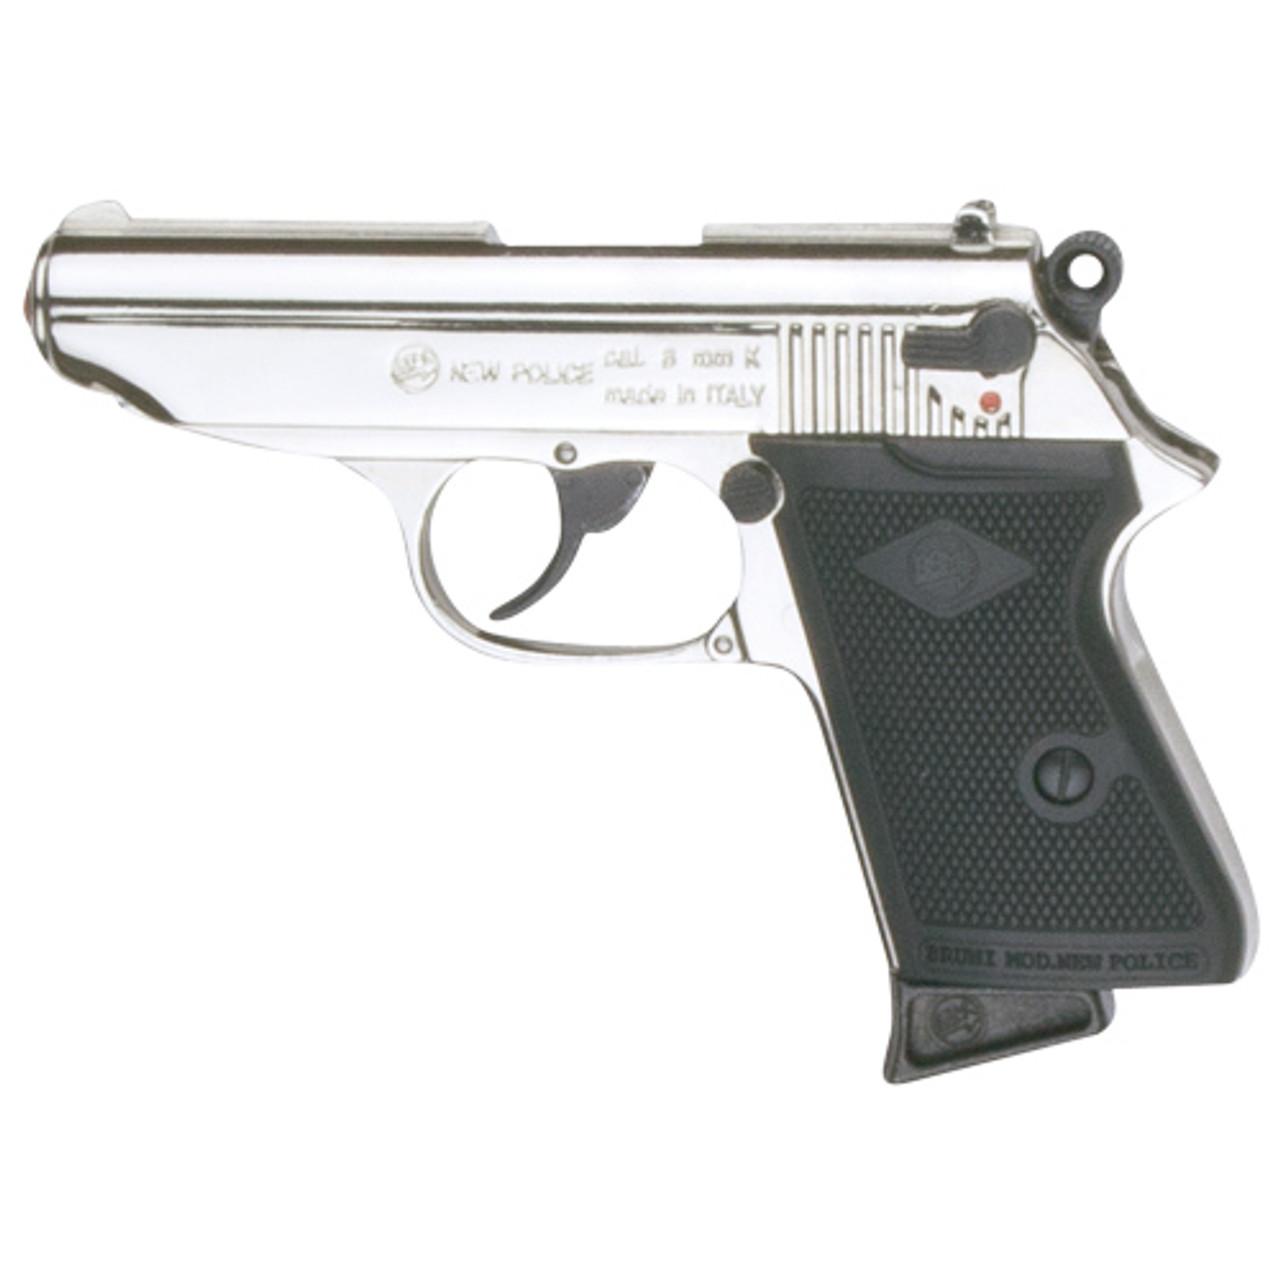 Replica James Bond Style Black 9MM Blank Firing Automatic ...